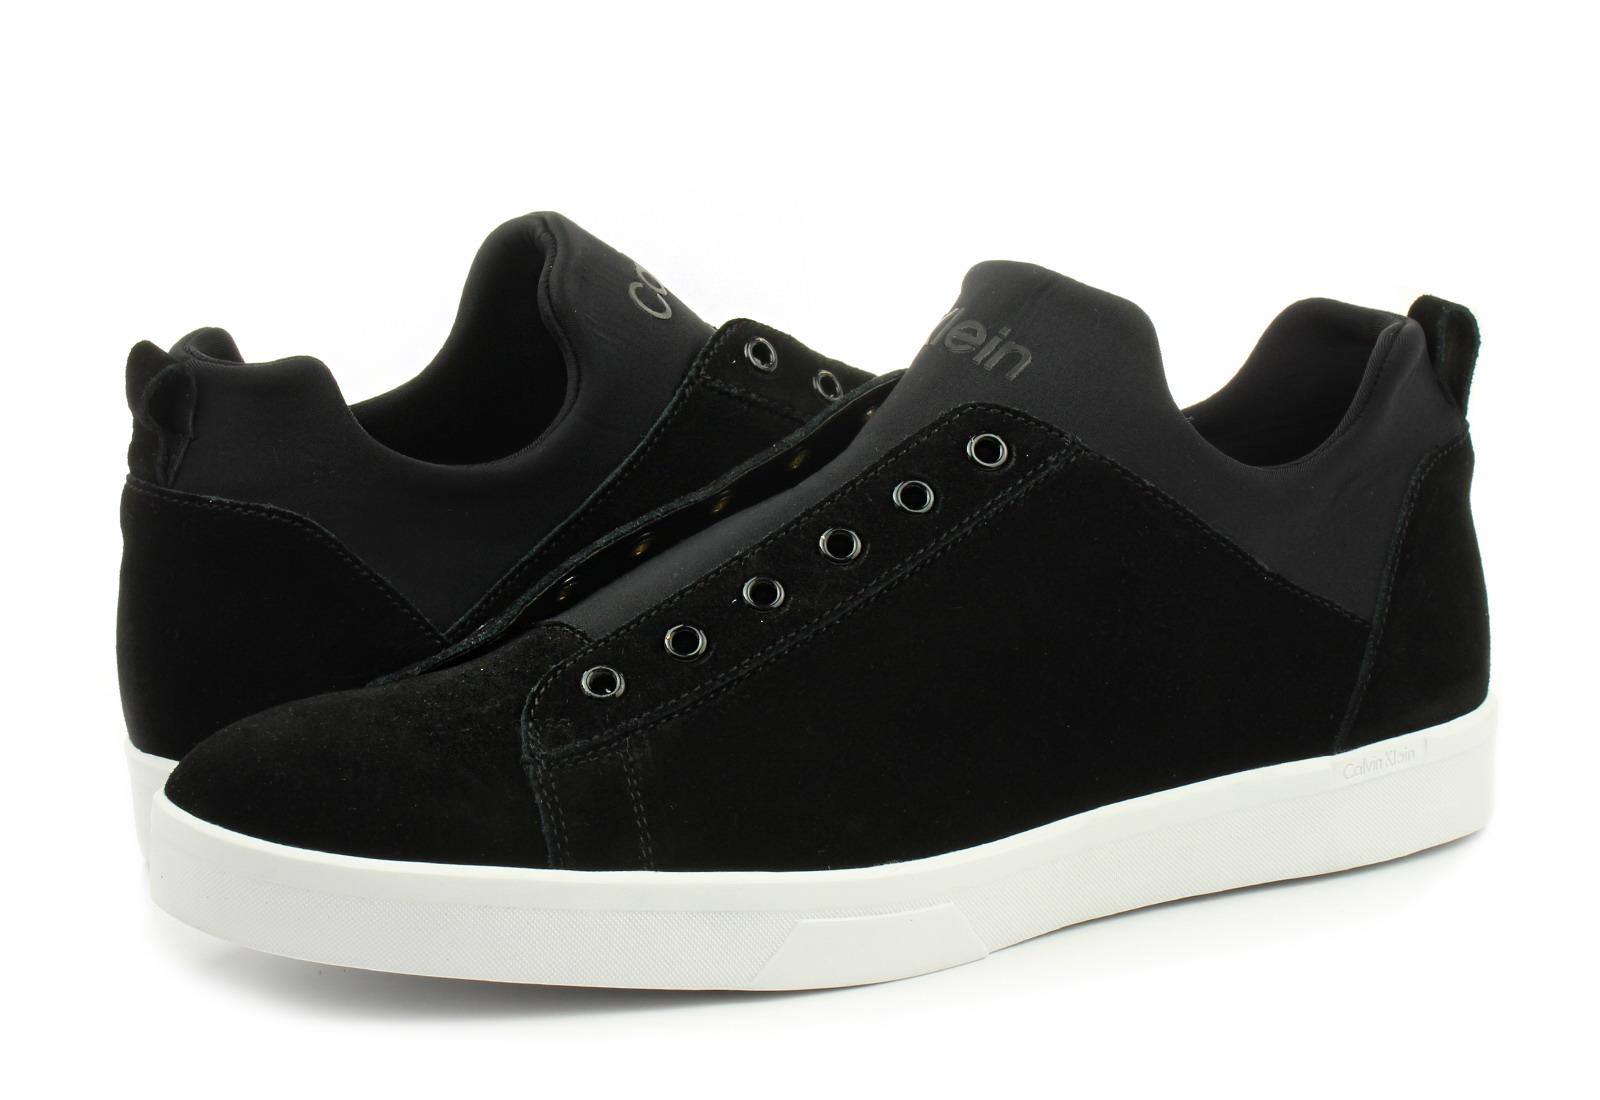 Calvin Klein Black Label Nízké boty Iver